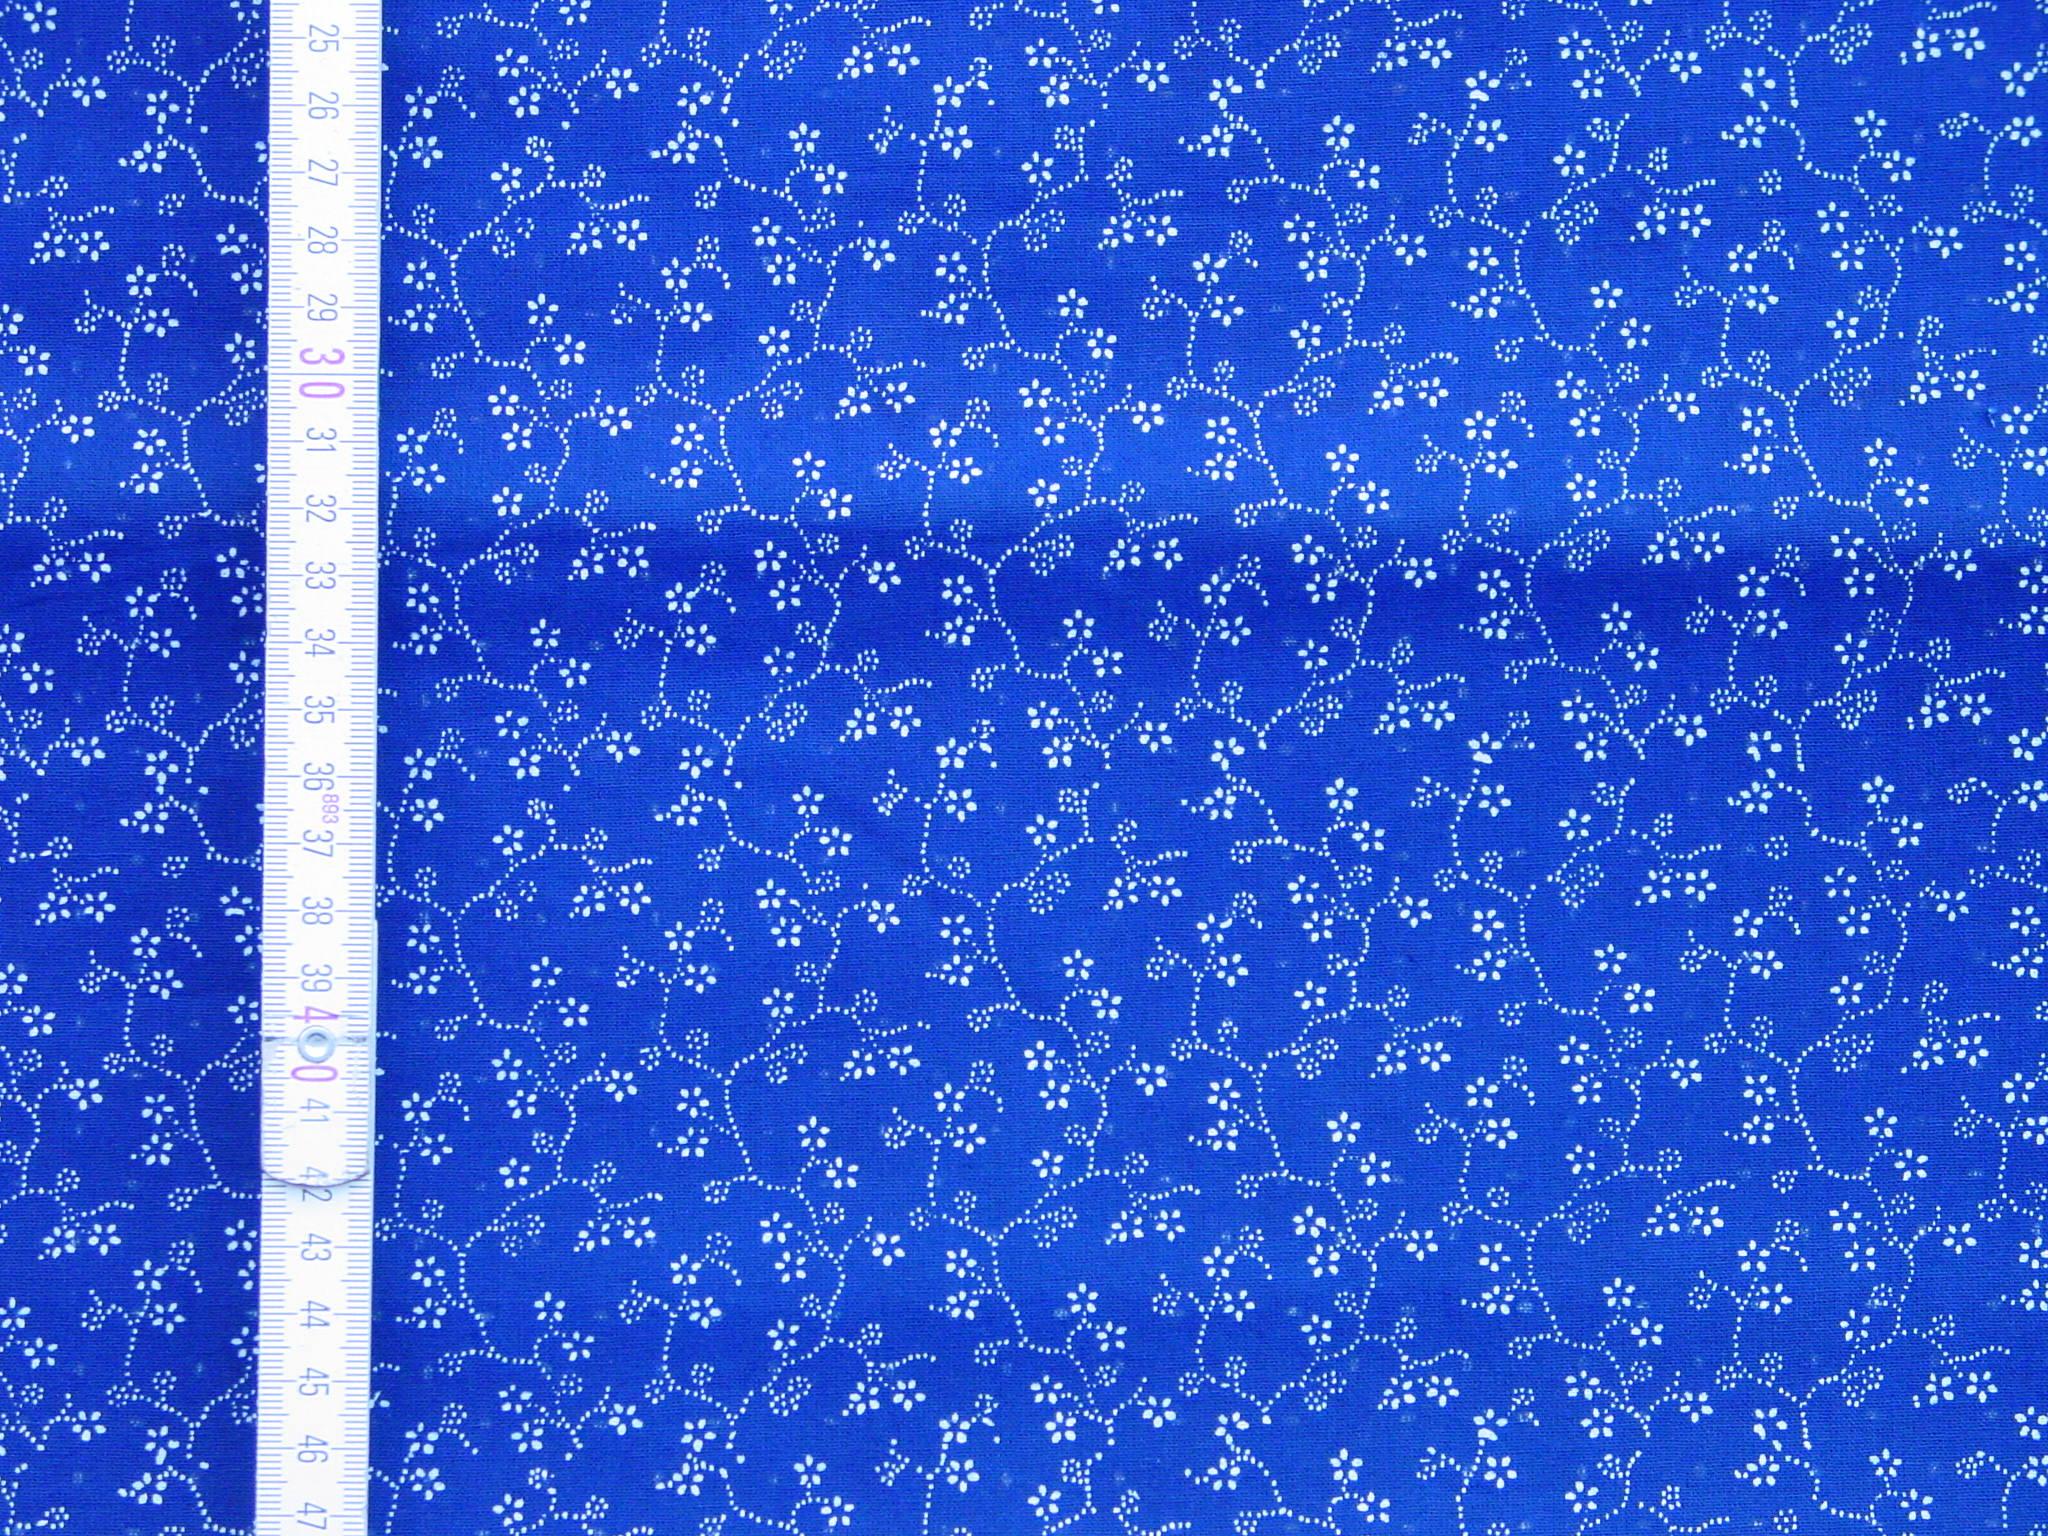 Doppeldruck-Blaudruckstoff 052-1010